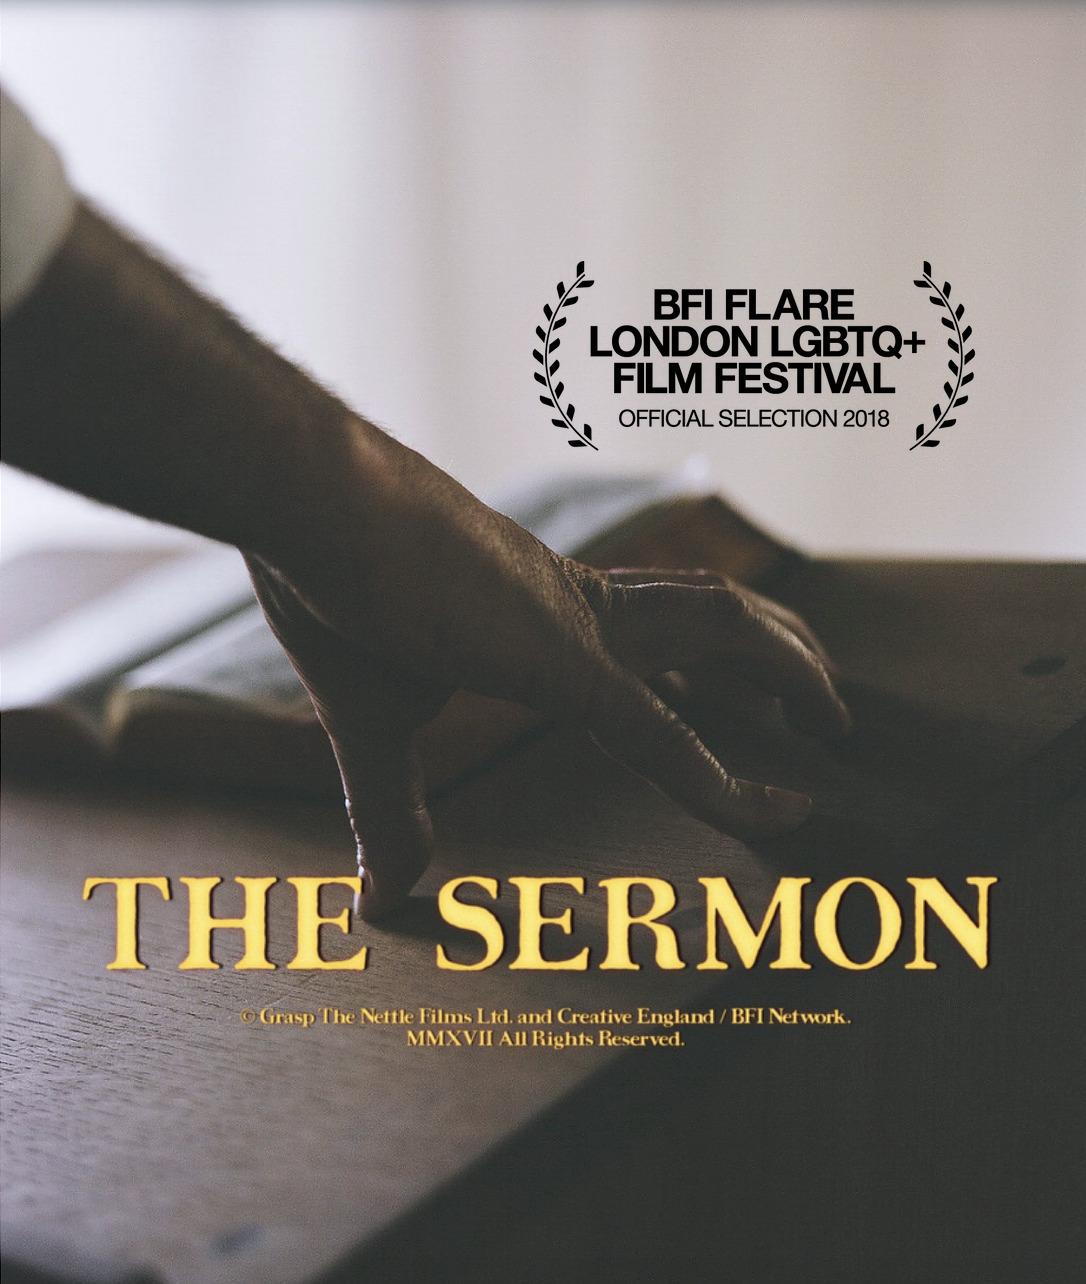 The Sermon BFI Flare 2018.jpeg